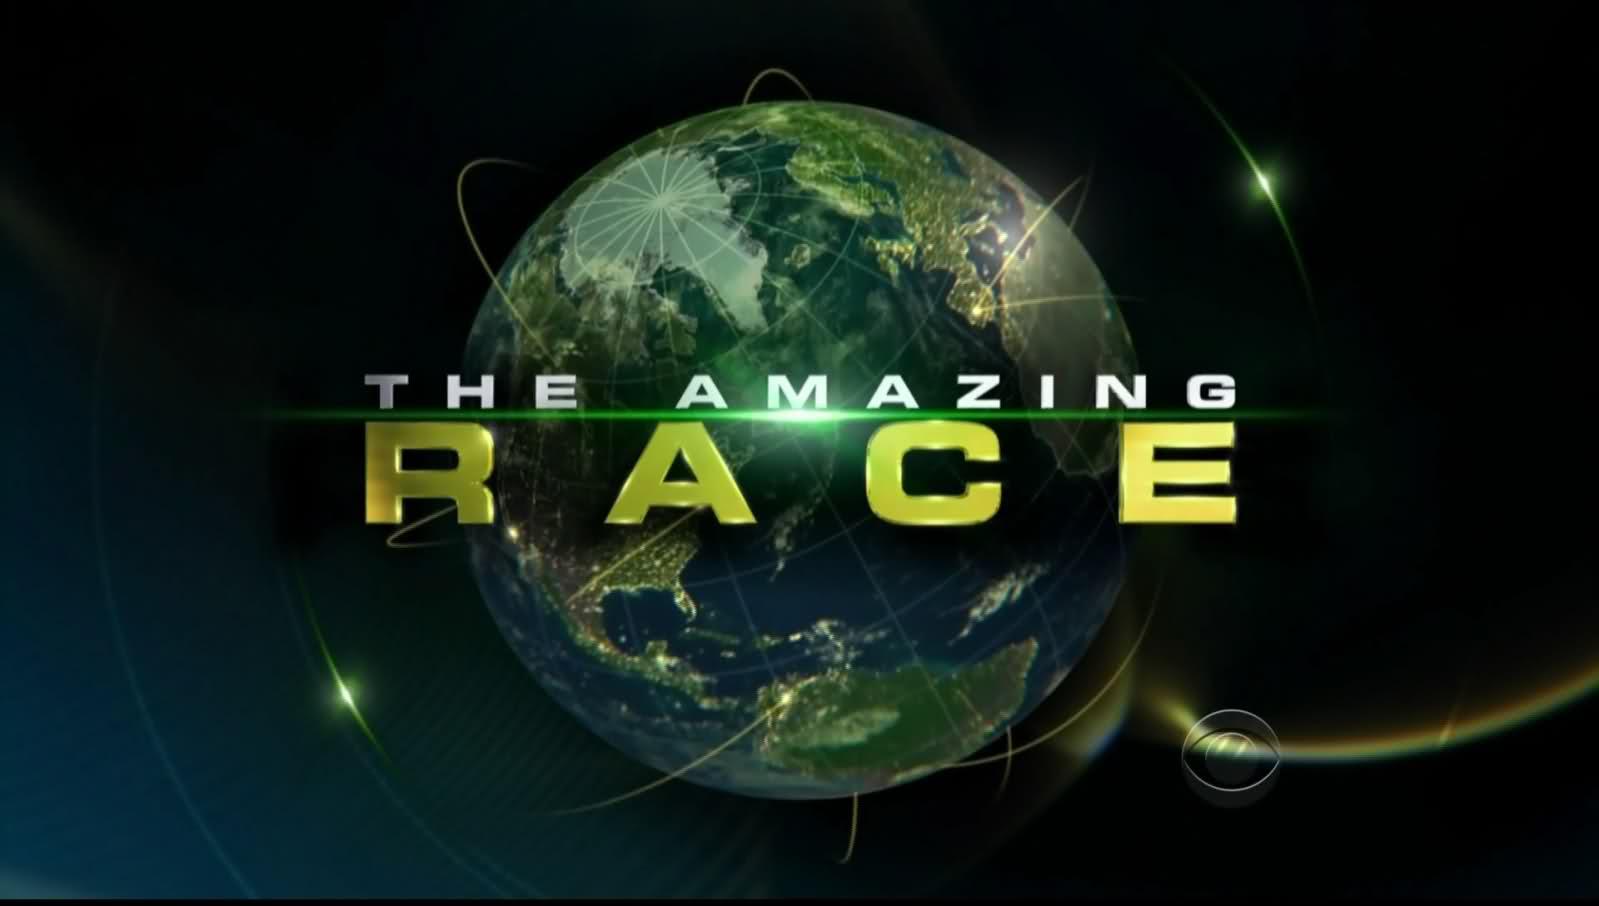 WEP '12, Day 76 - Amazing Race 20 Analysis, Ep. 5